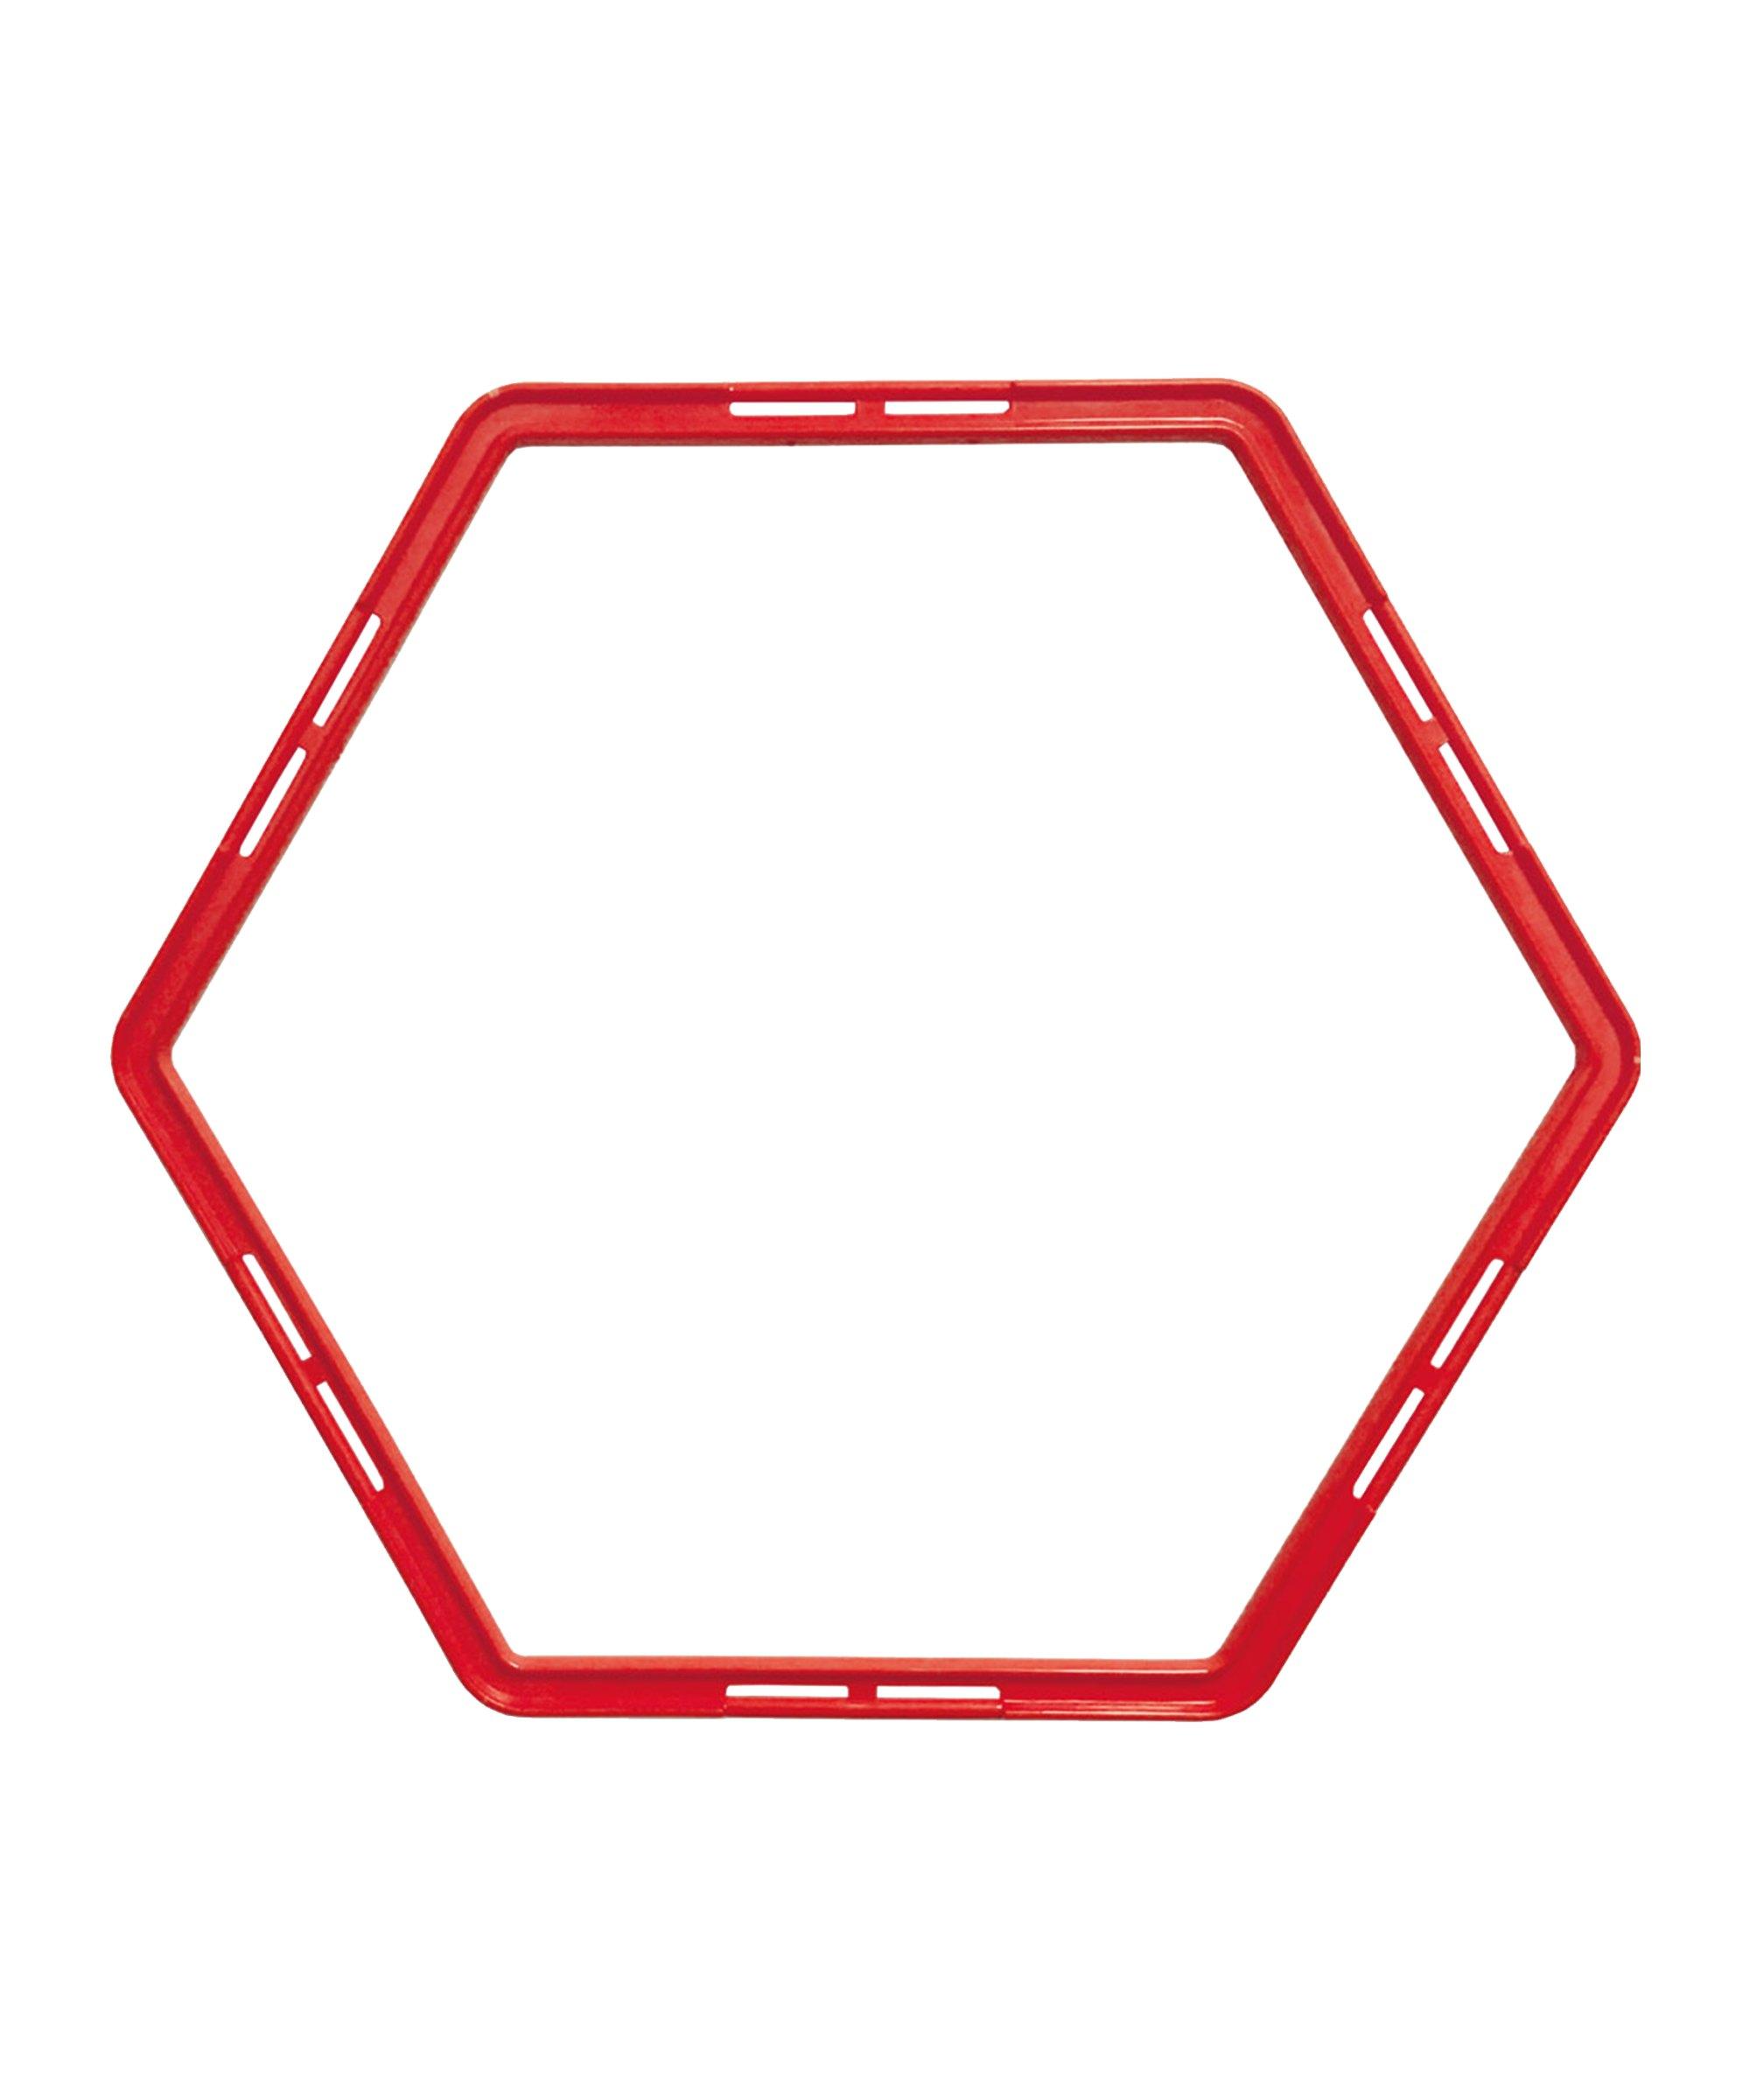 Cawila PRO TRAINING Hexa-Hoops Set d49mm Rot - rot